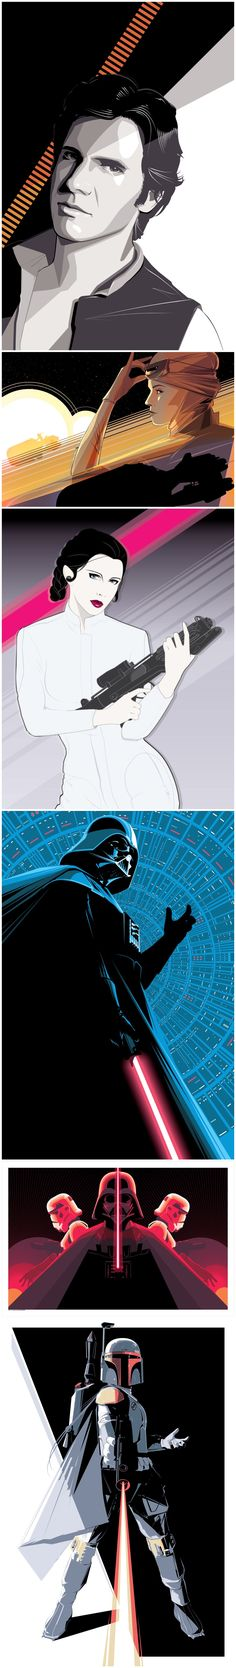 Star Wars Illustrations - Created by Craig Drake